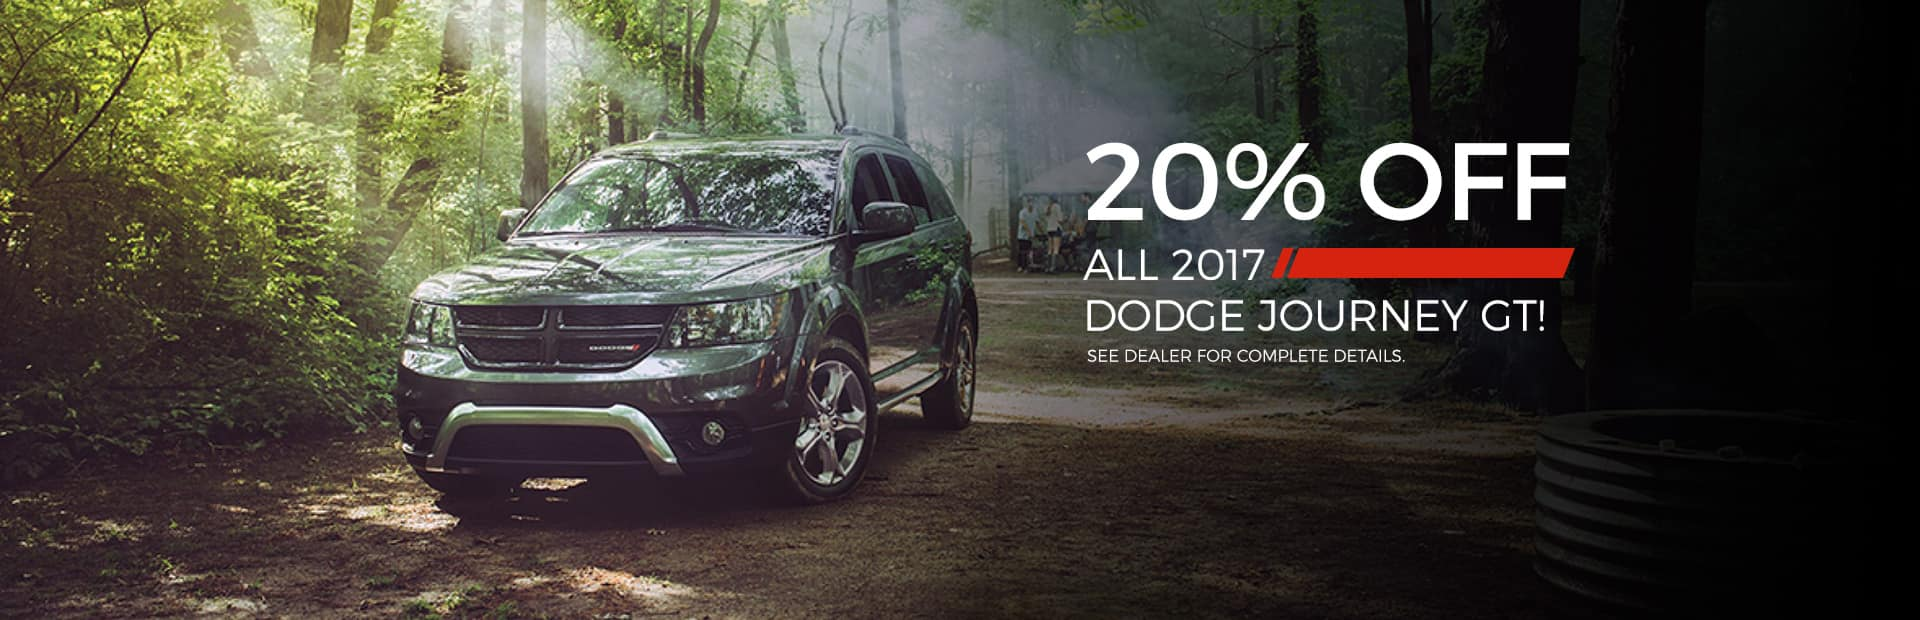 20% off 2017 dodge journey